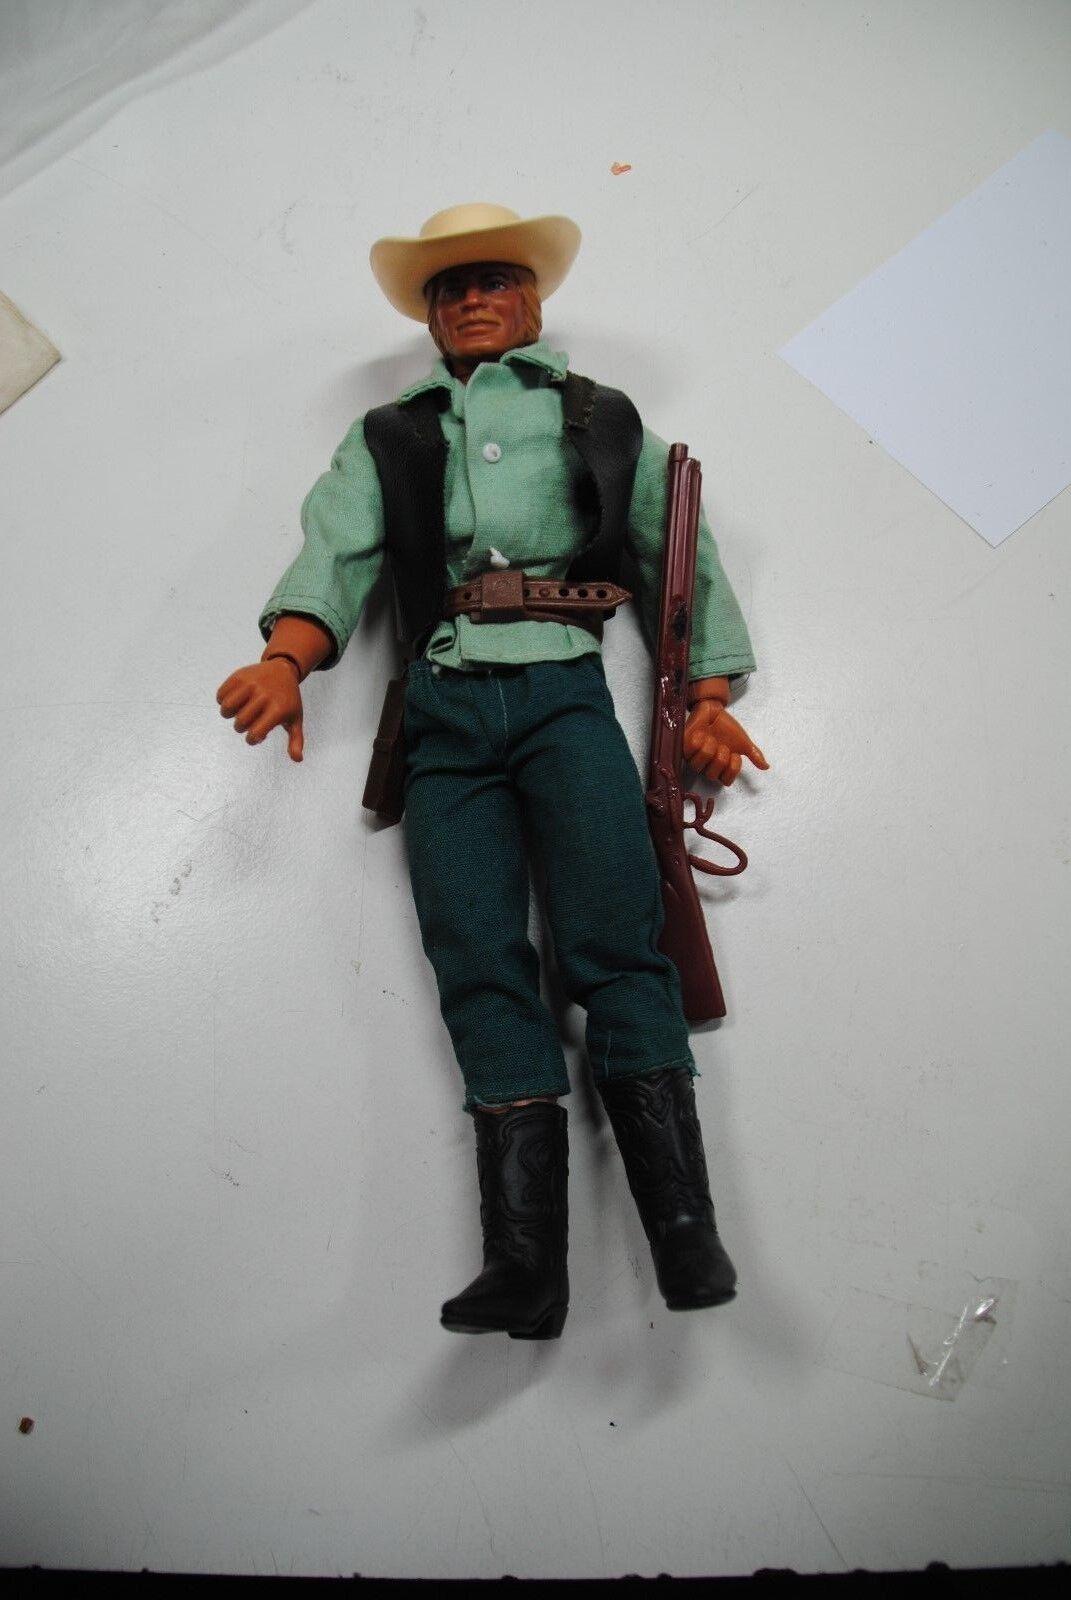 Big Jim MATTEL viejo de los APACHES SHATTERHAND  figura de mano de agarre  Ranger de Texas